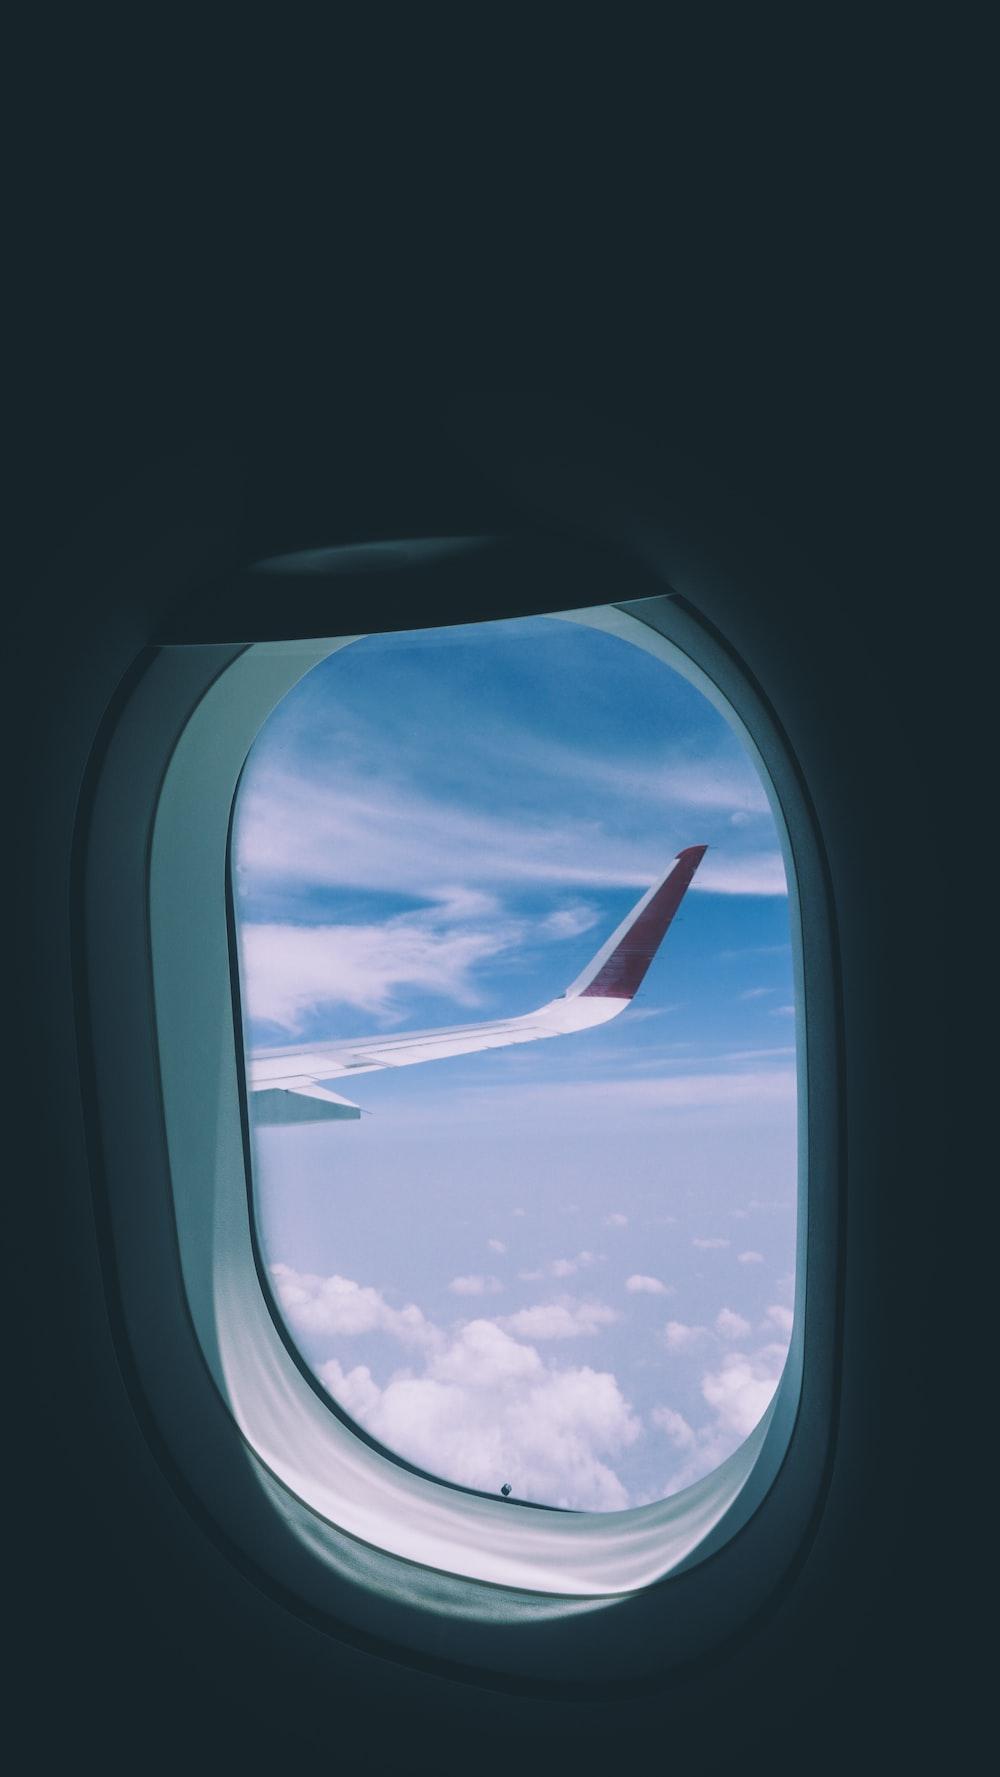 photo of airplane taking flight